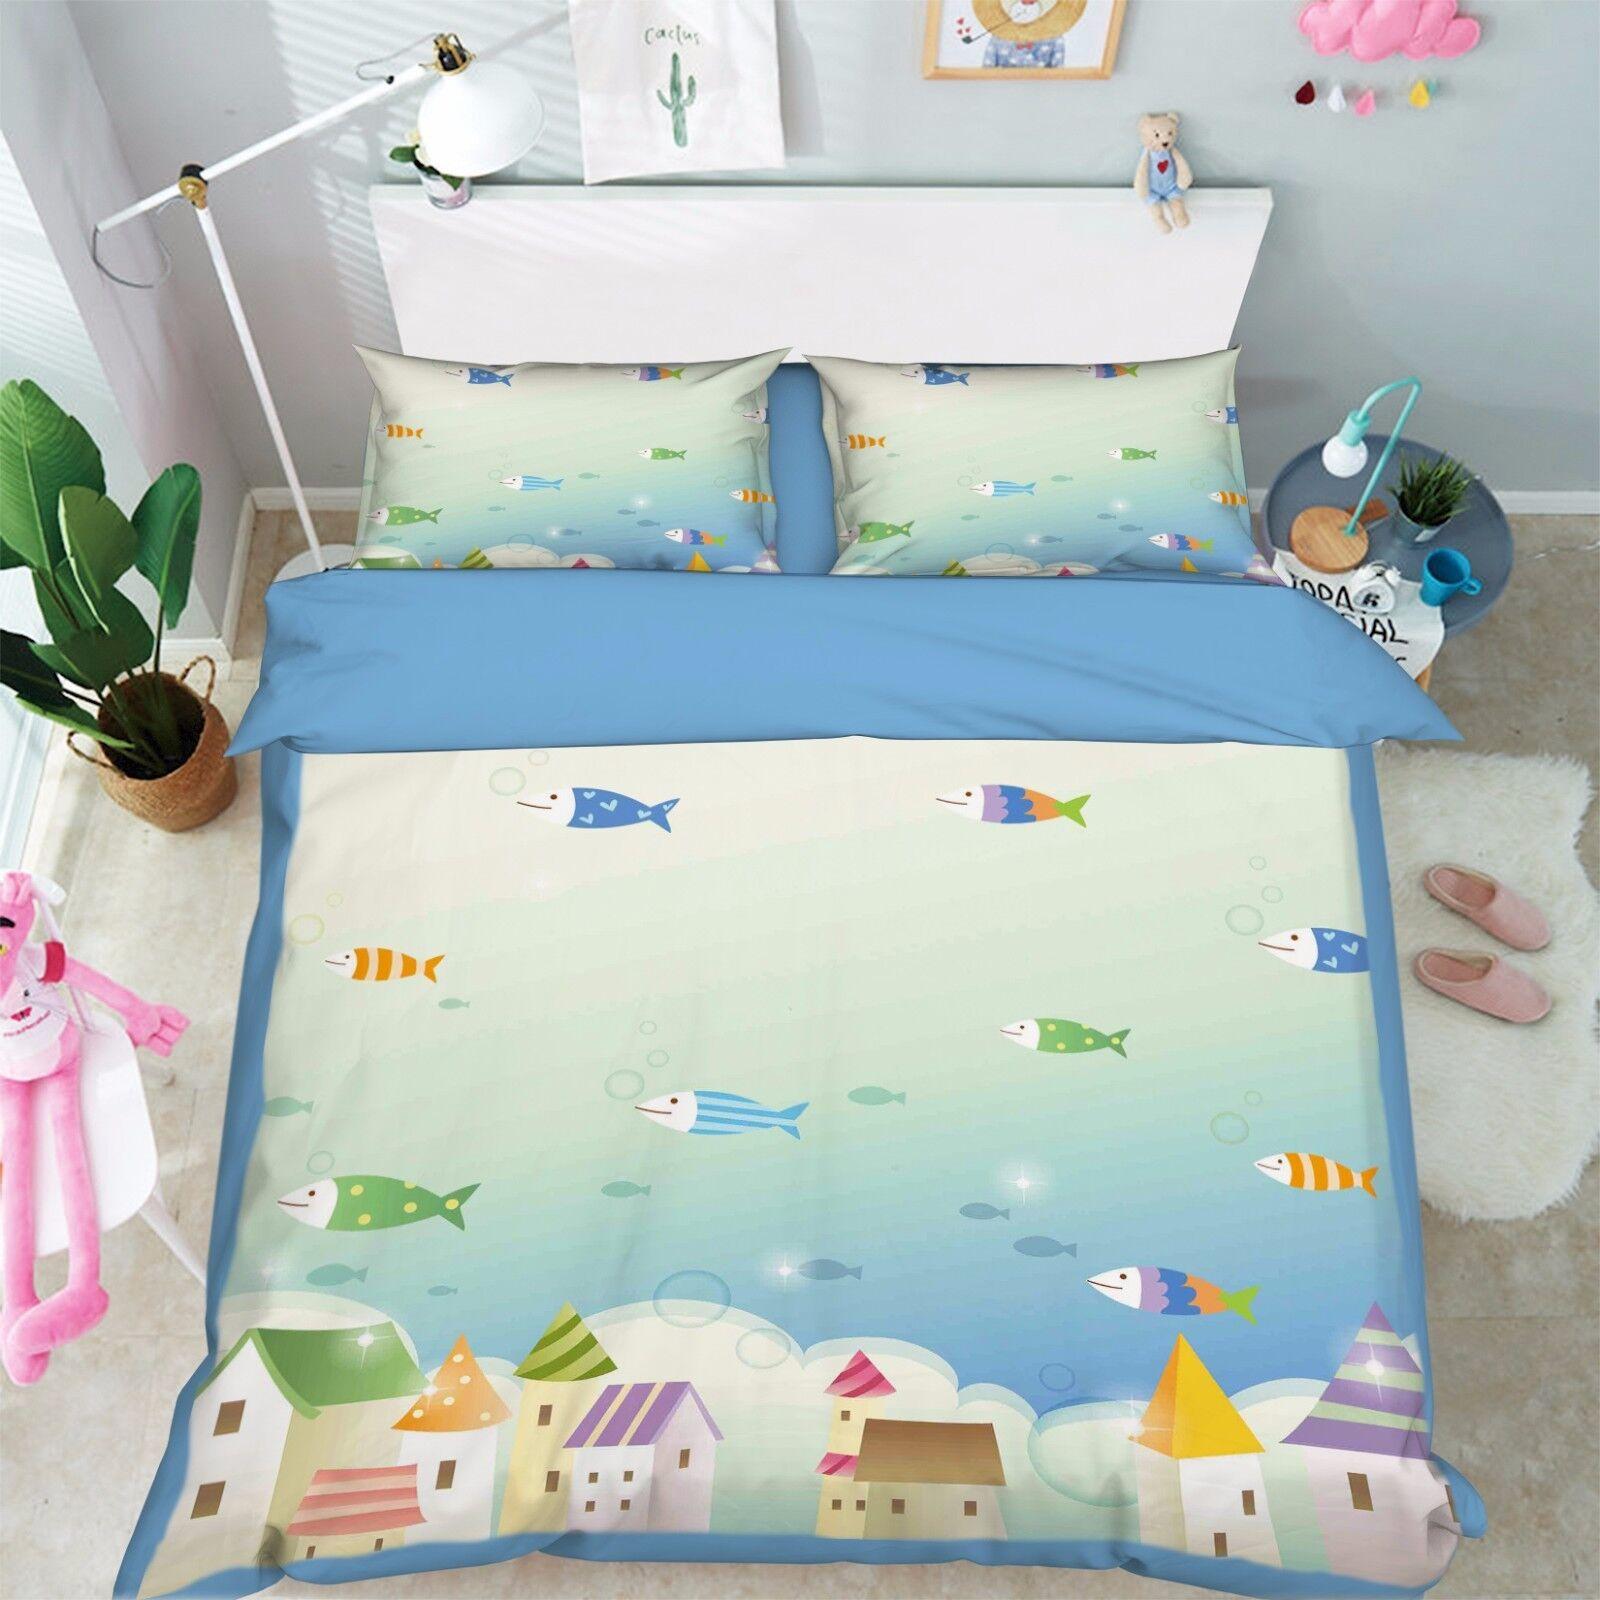 3D Fly Fish ColGoldt Hut 47 Bed Pillowcases Quilt Duvet Cover Set Single Queen CA